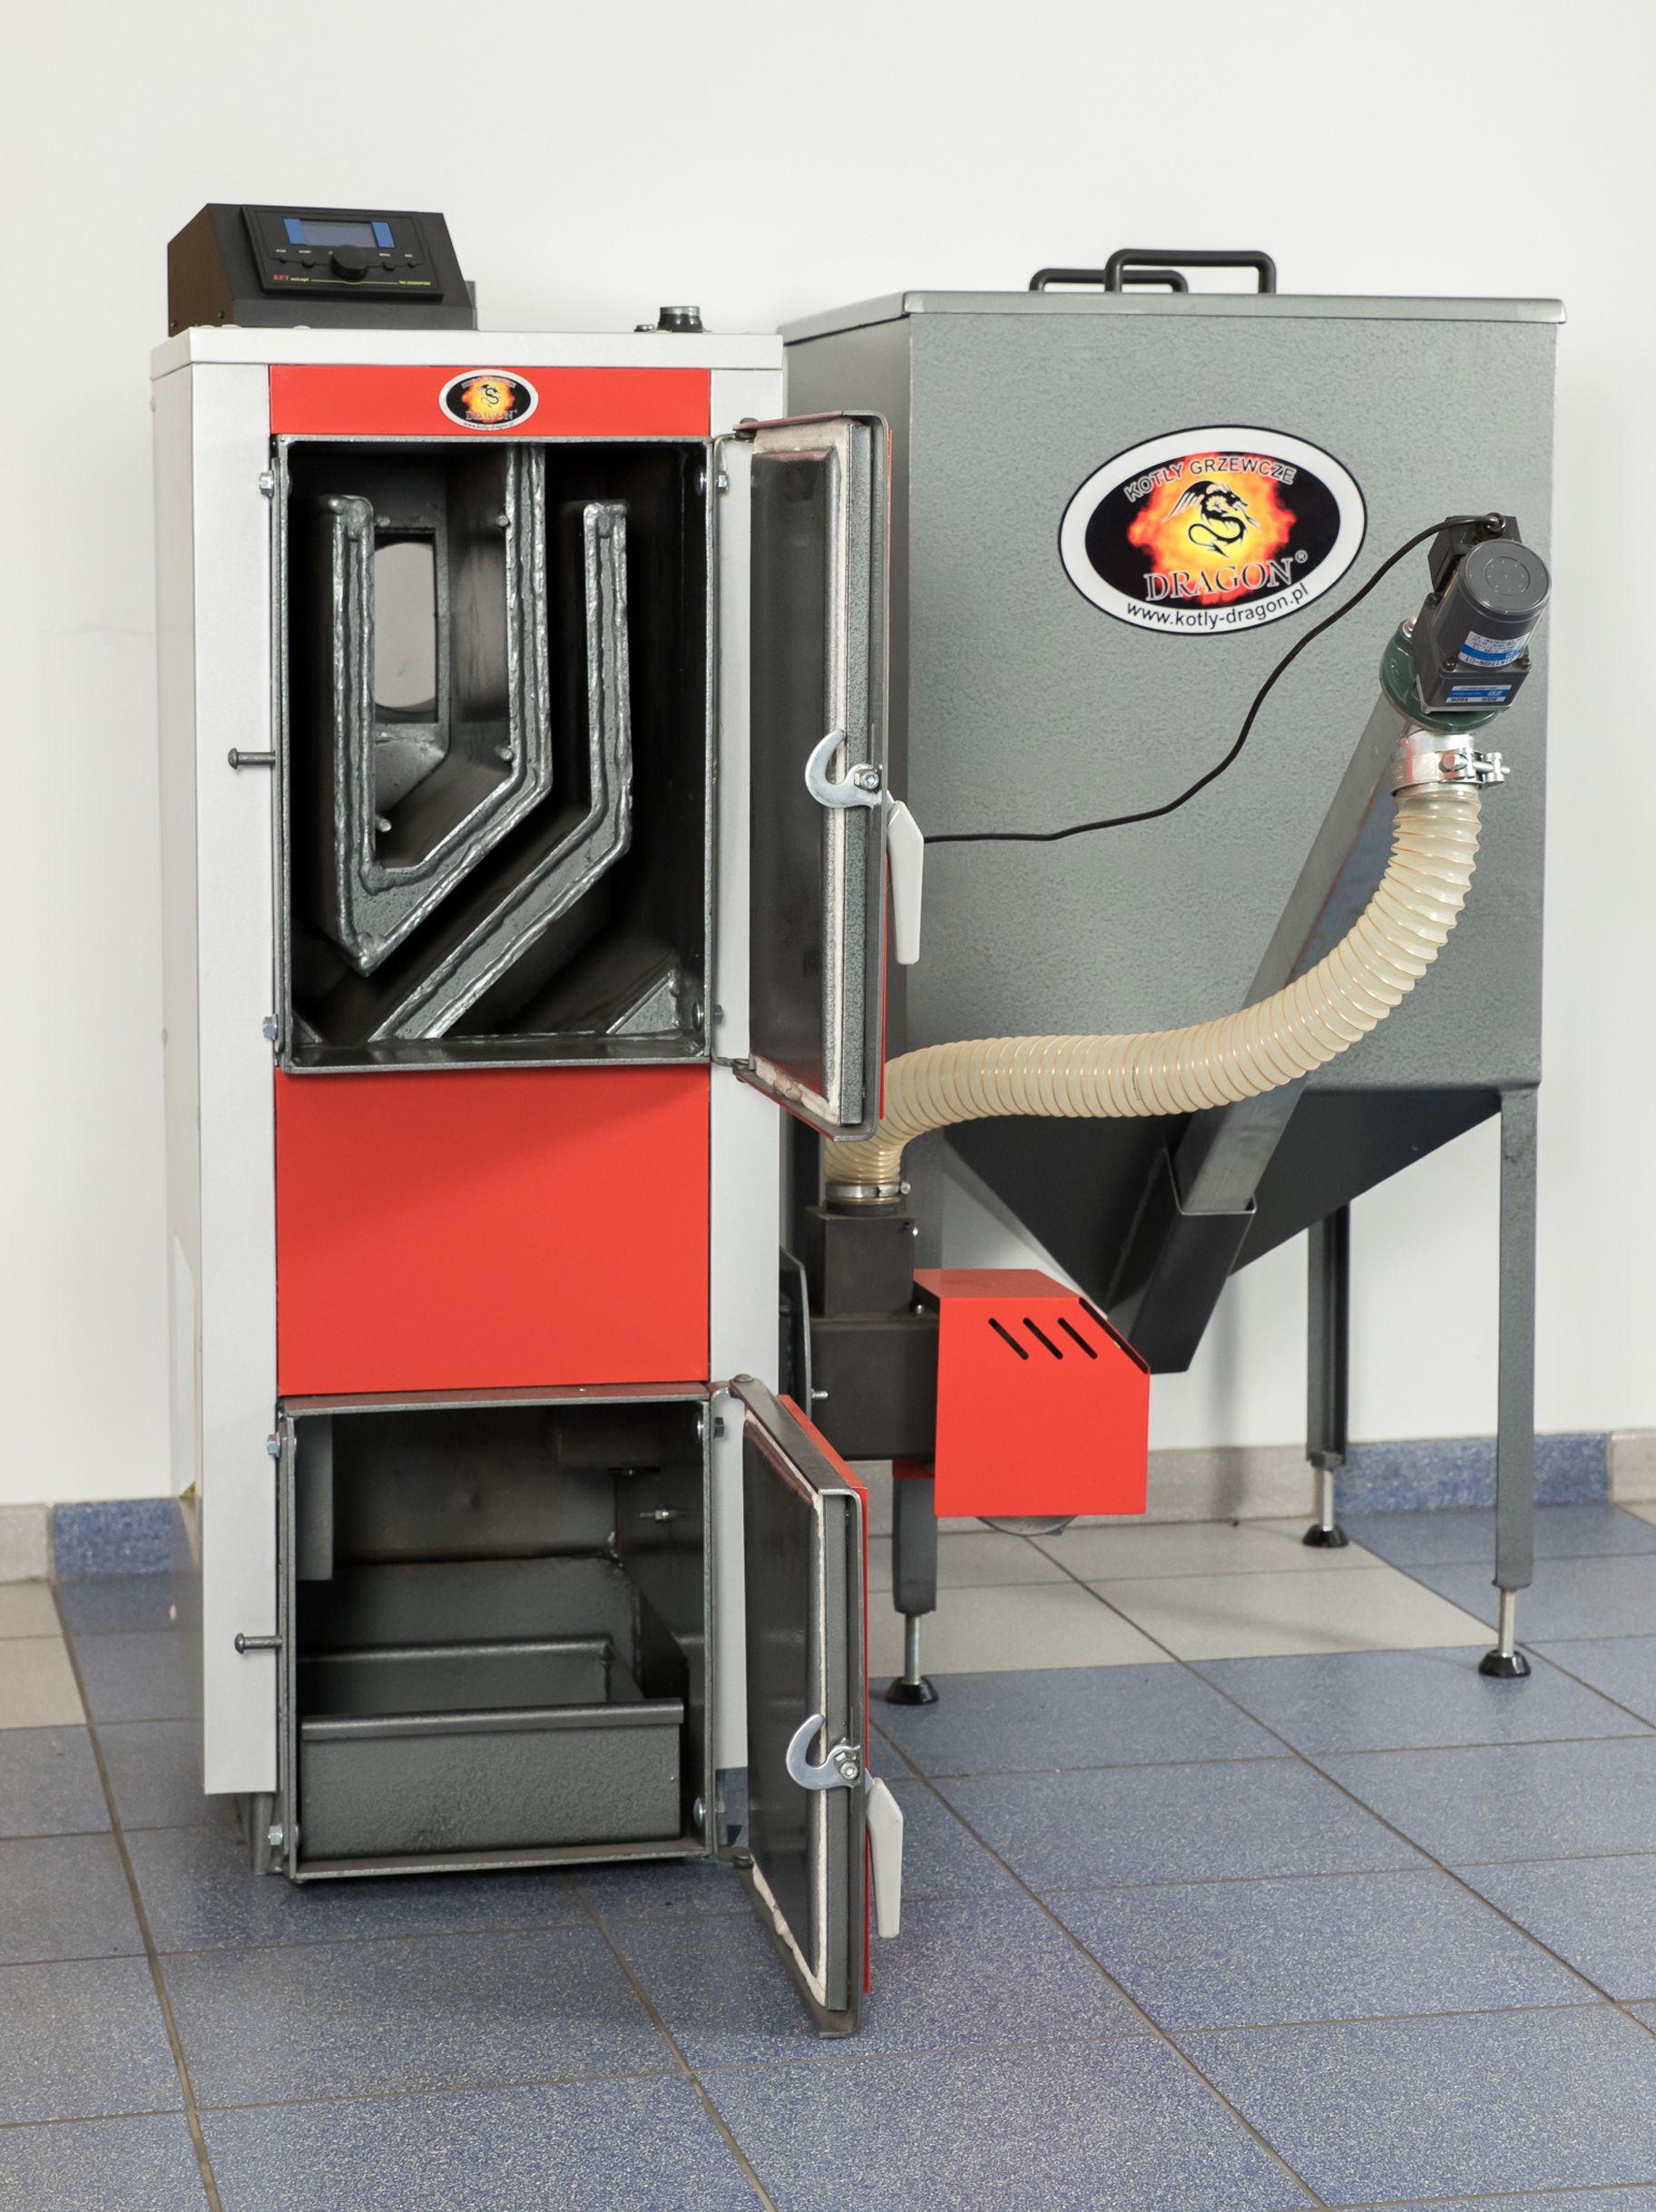 Kociol Piec Pellet Klasa 5 Z Podajnikiem Moc 21kw Locker Storage Storage Lockers